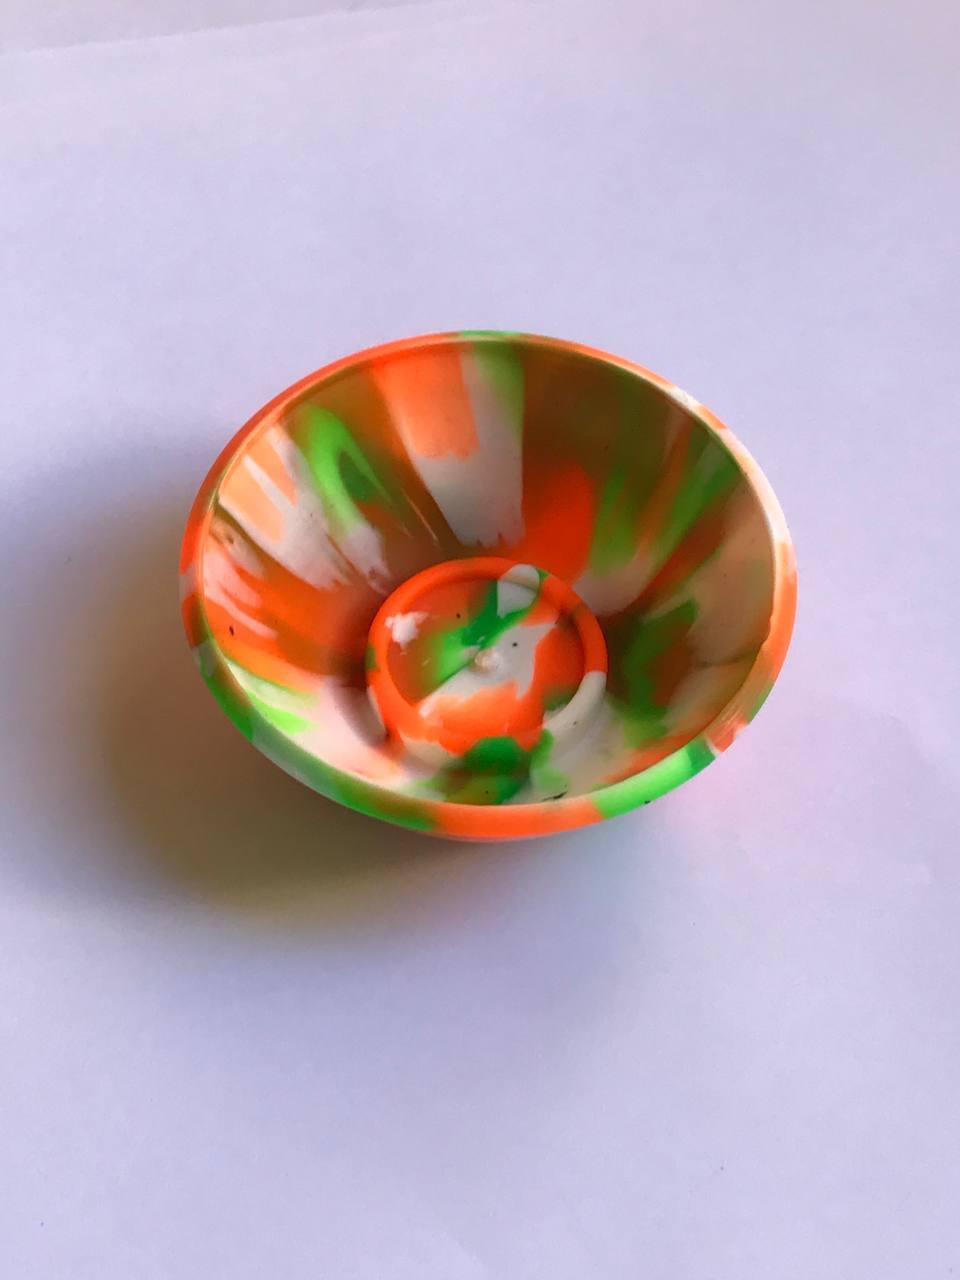 Cuia de silicone